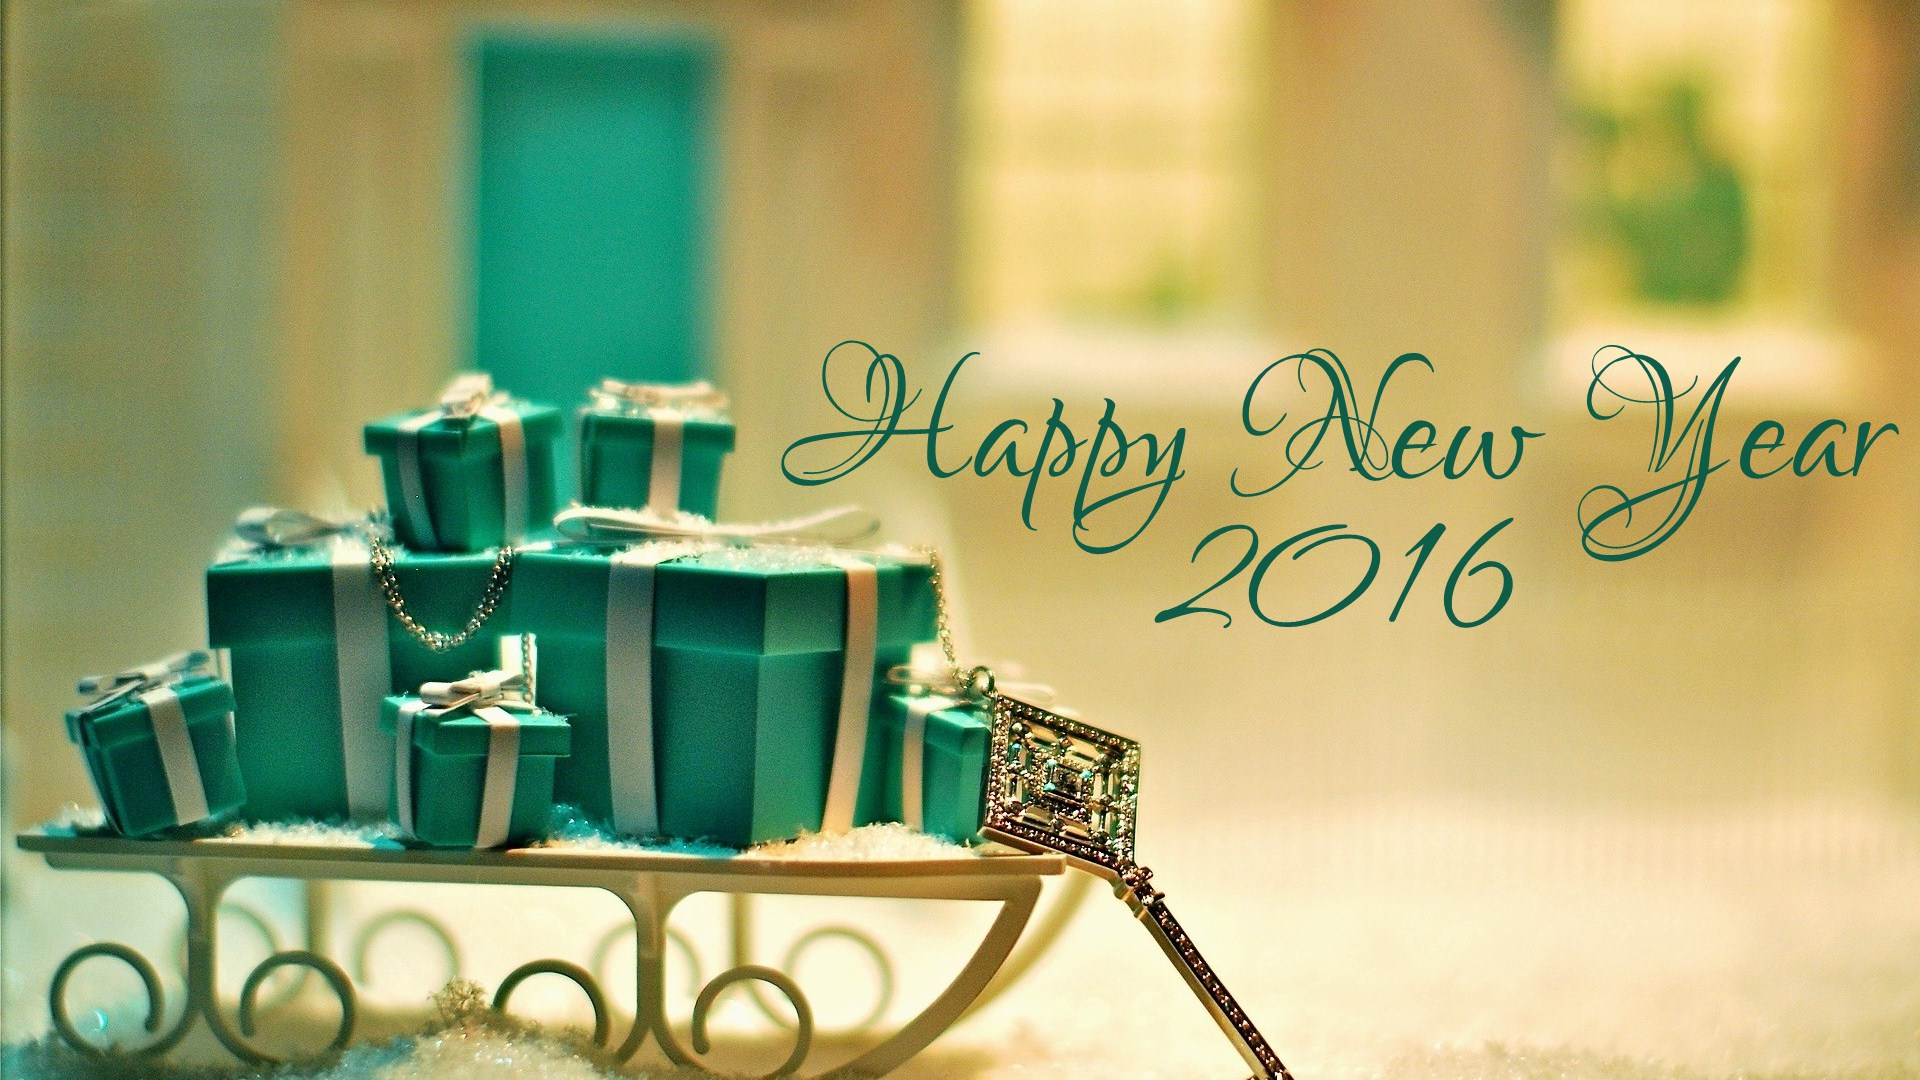 Feliz 2016 Farandulistas - Plus algunos chismes!